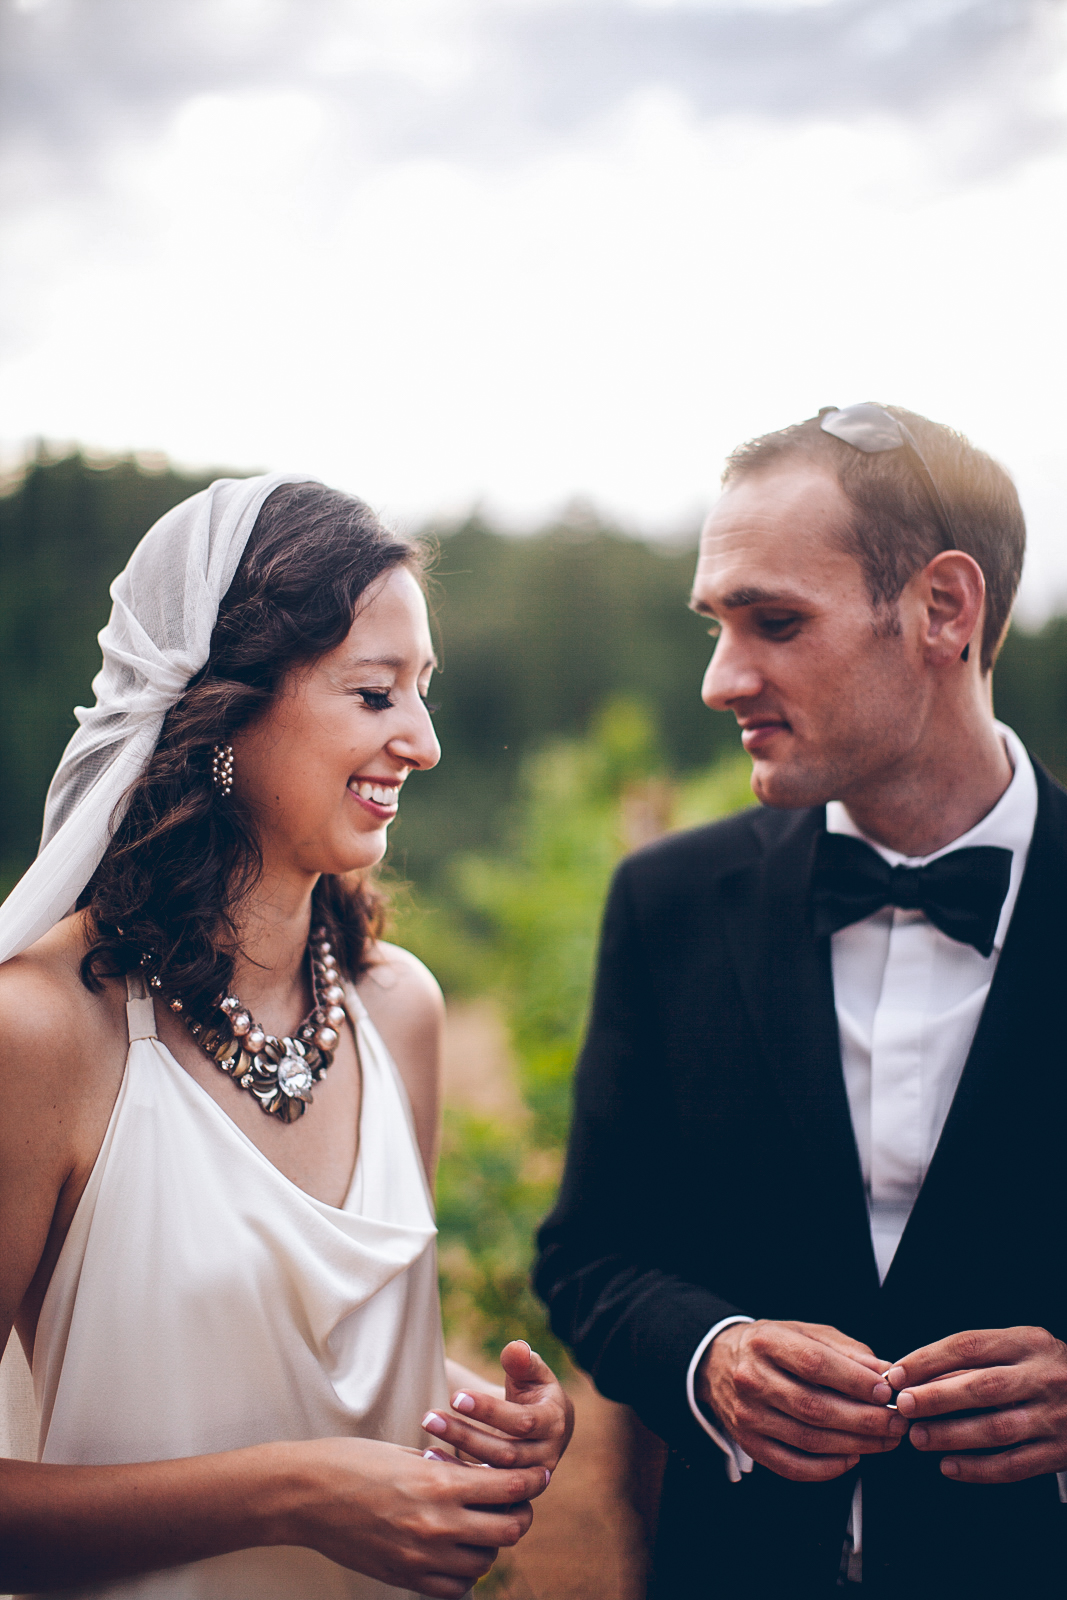 miraflores_winery_wedding_photography_ian_melissa_ebony_siovhan_bokeh_photography_64.jpg